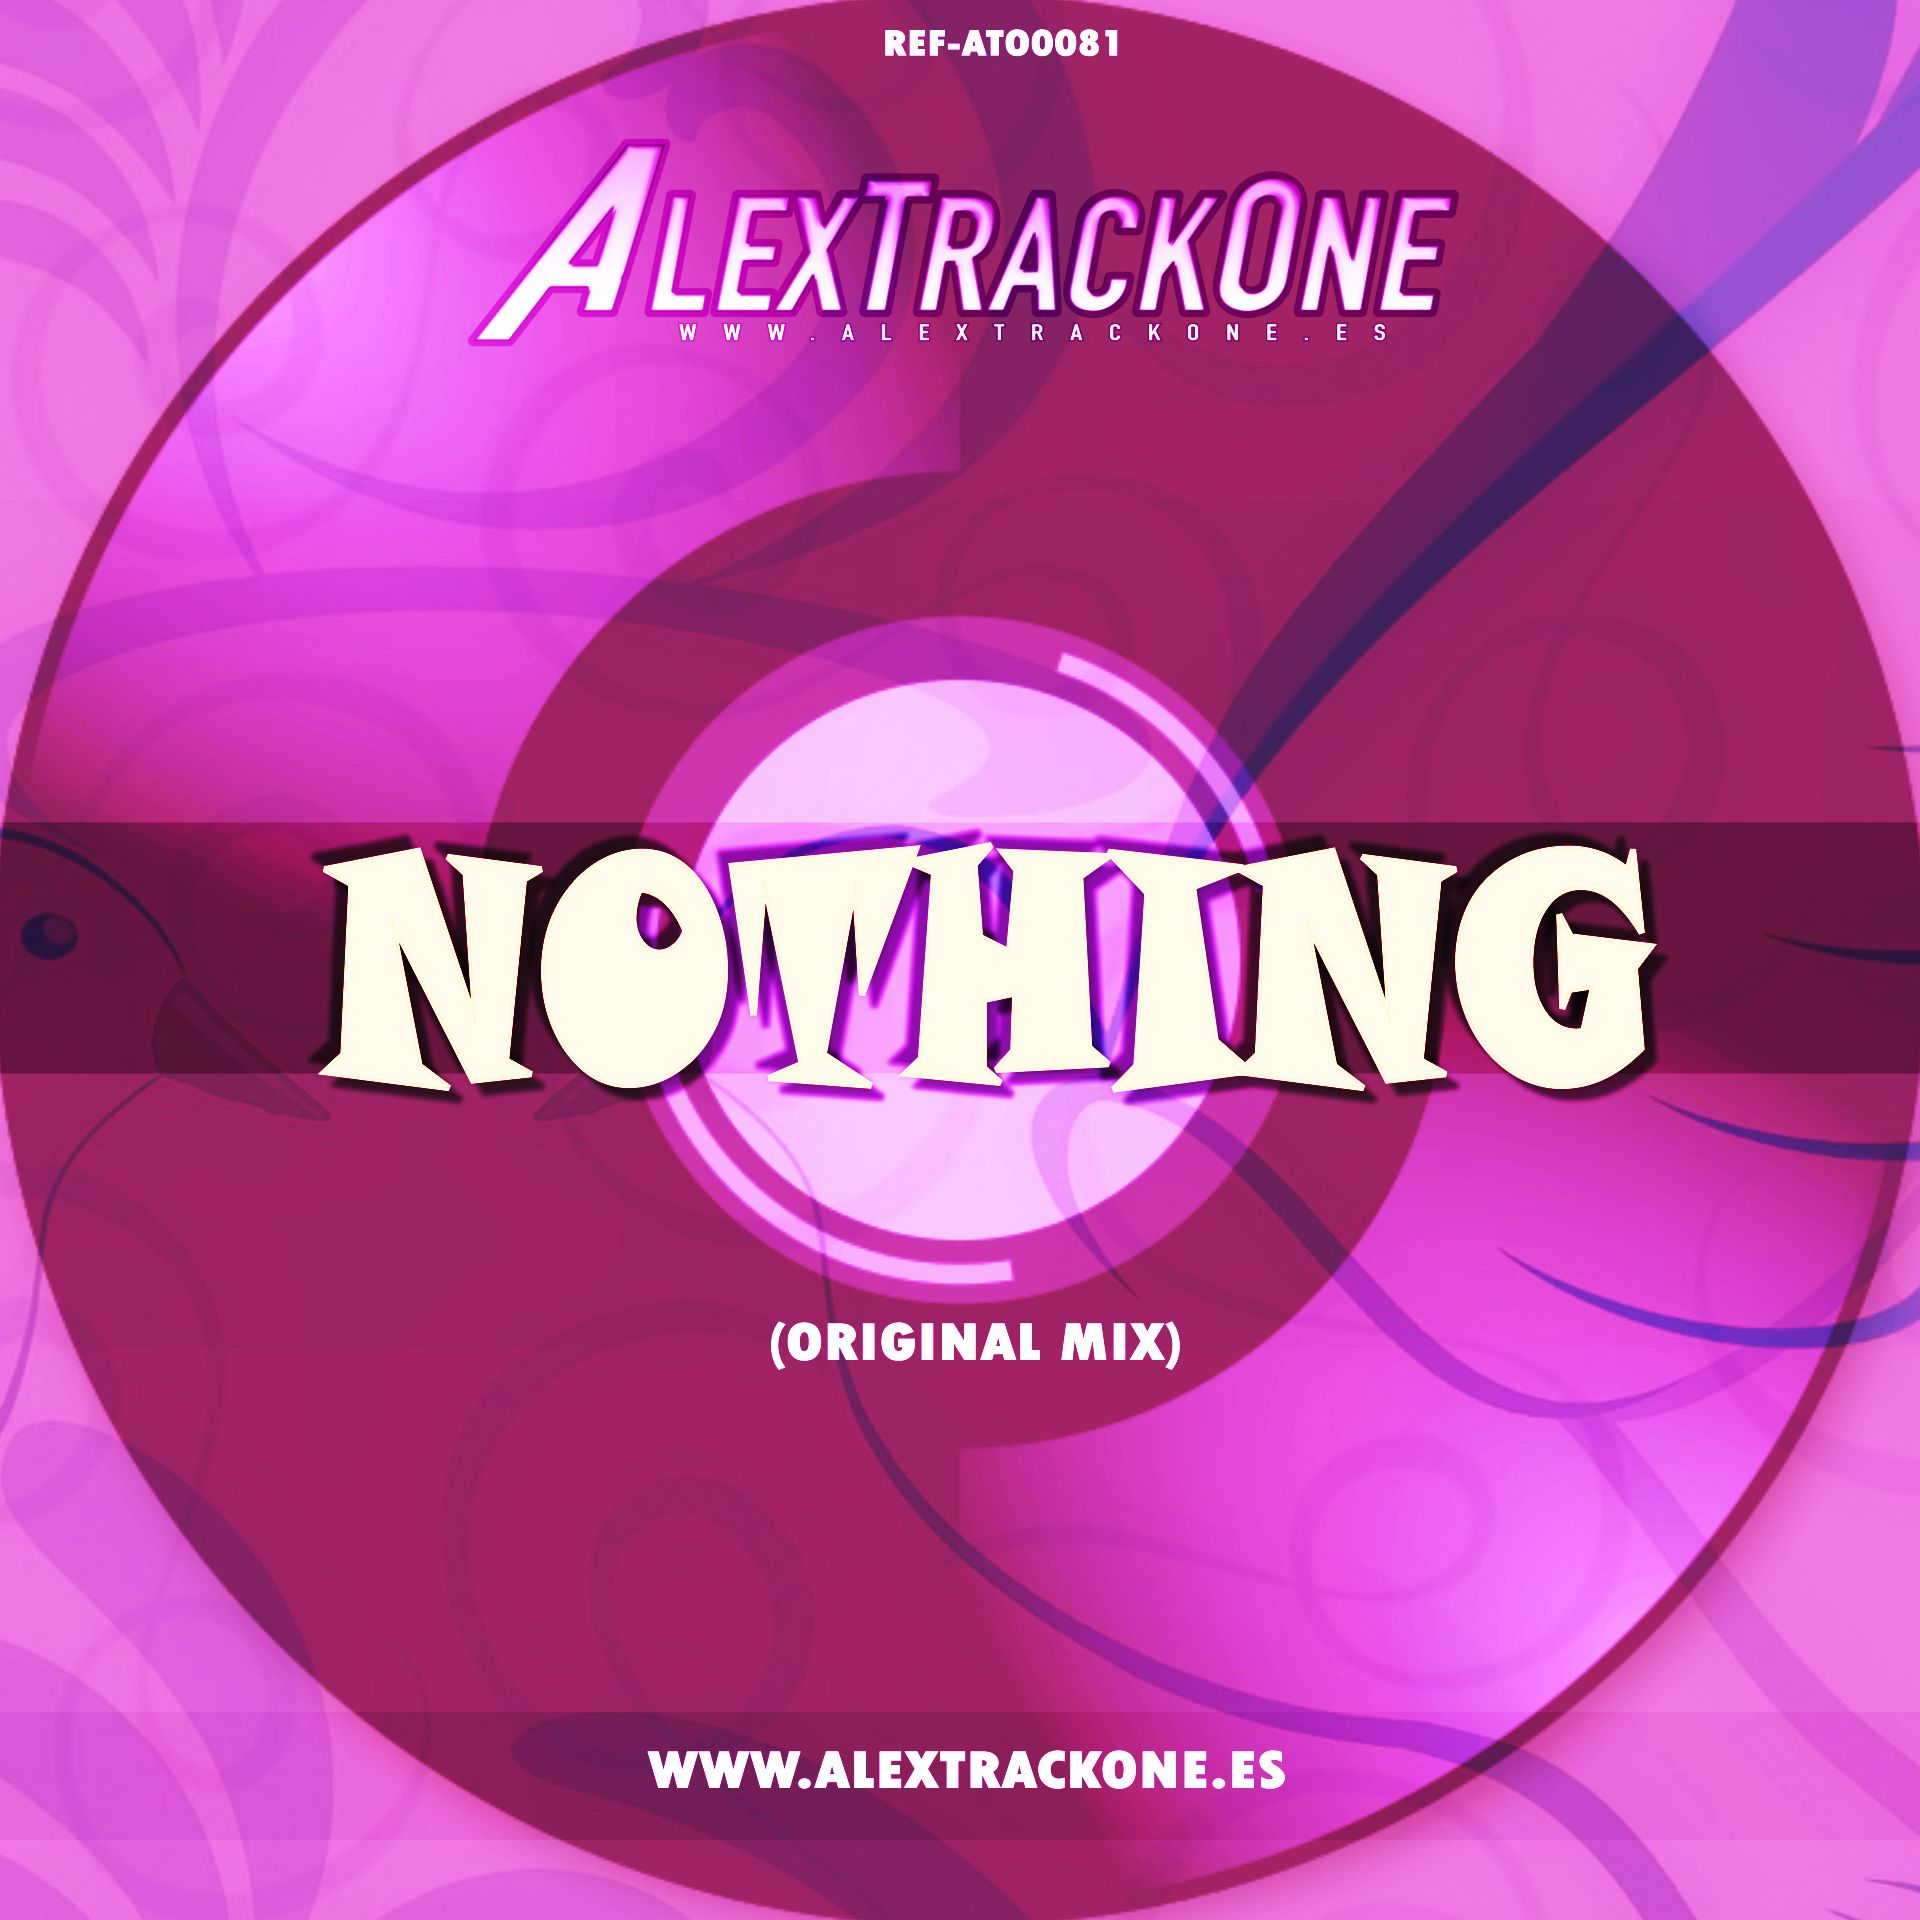 REF-ATO0081 NOTHING (ORIGINAL MIX) (MP3 & WAV & FLAC)